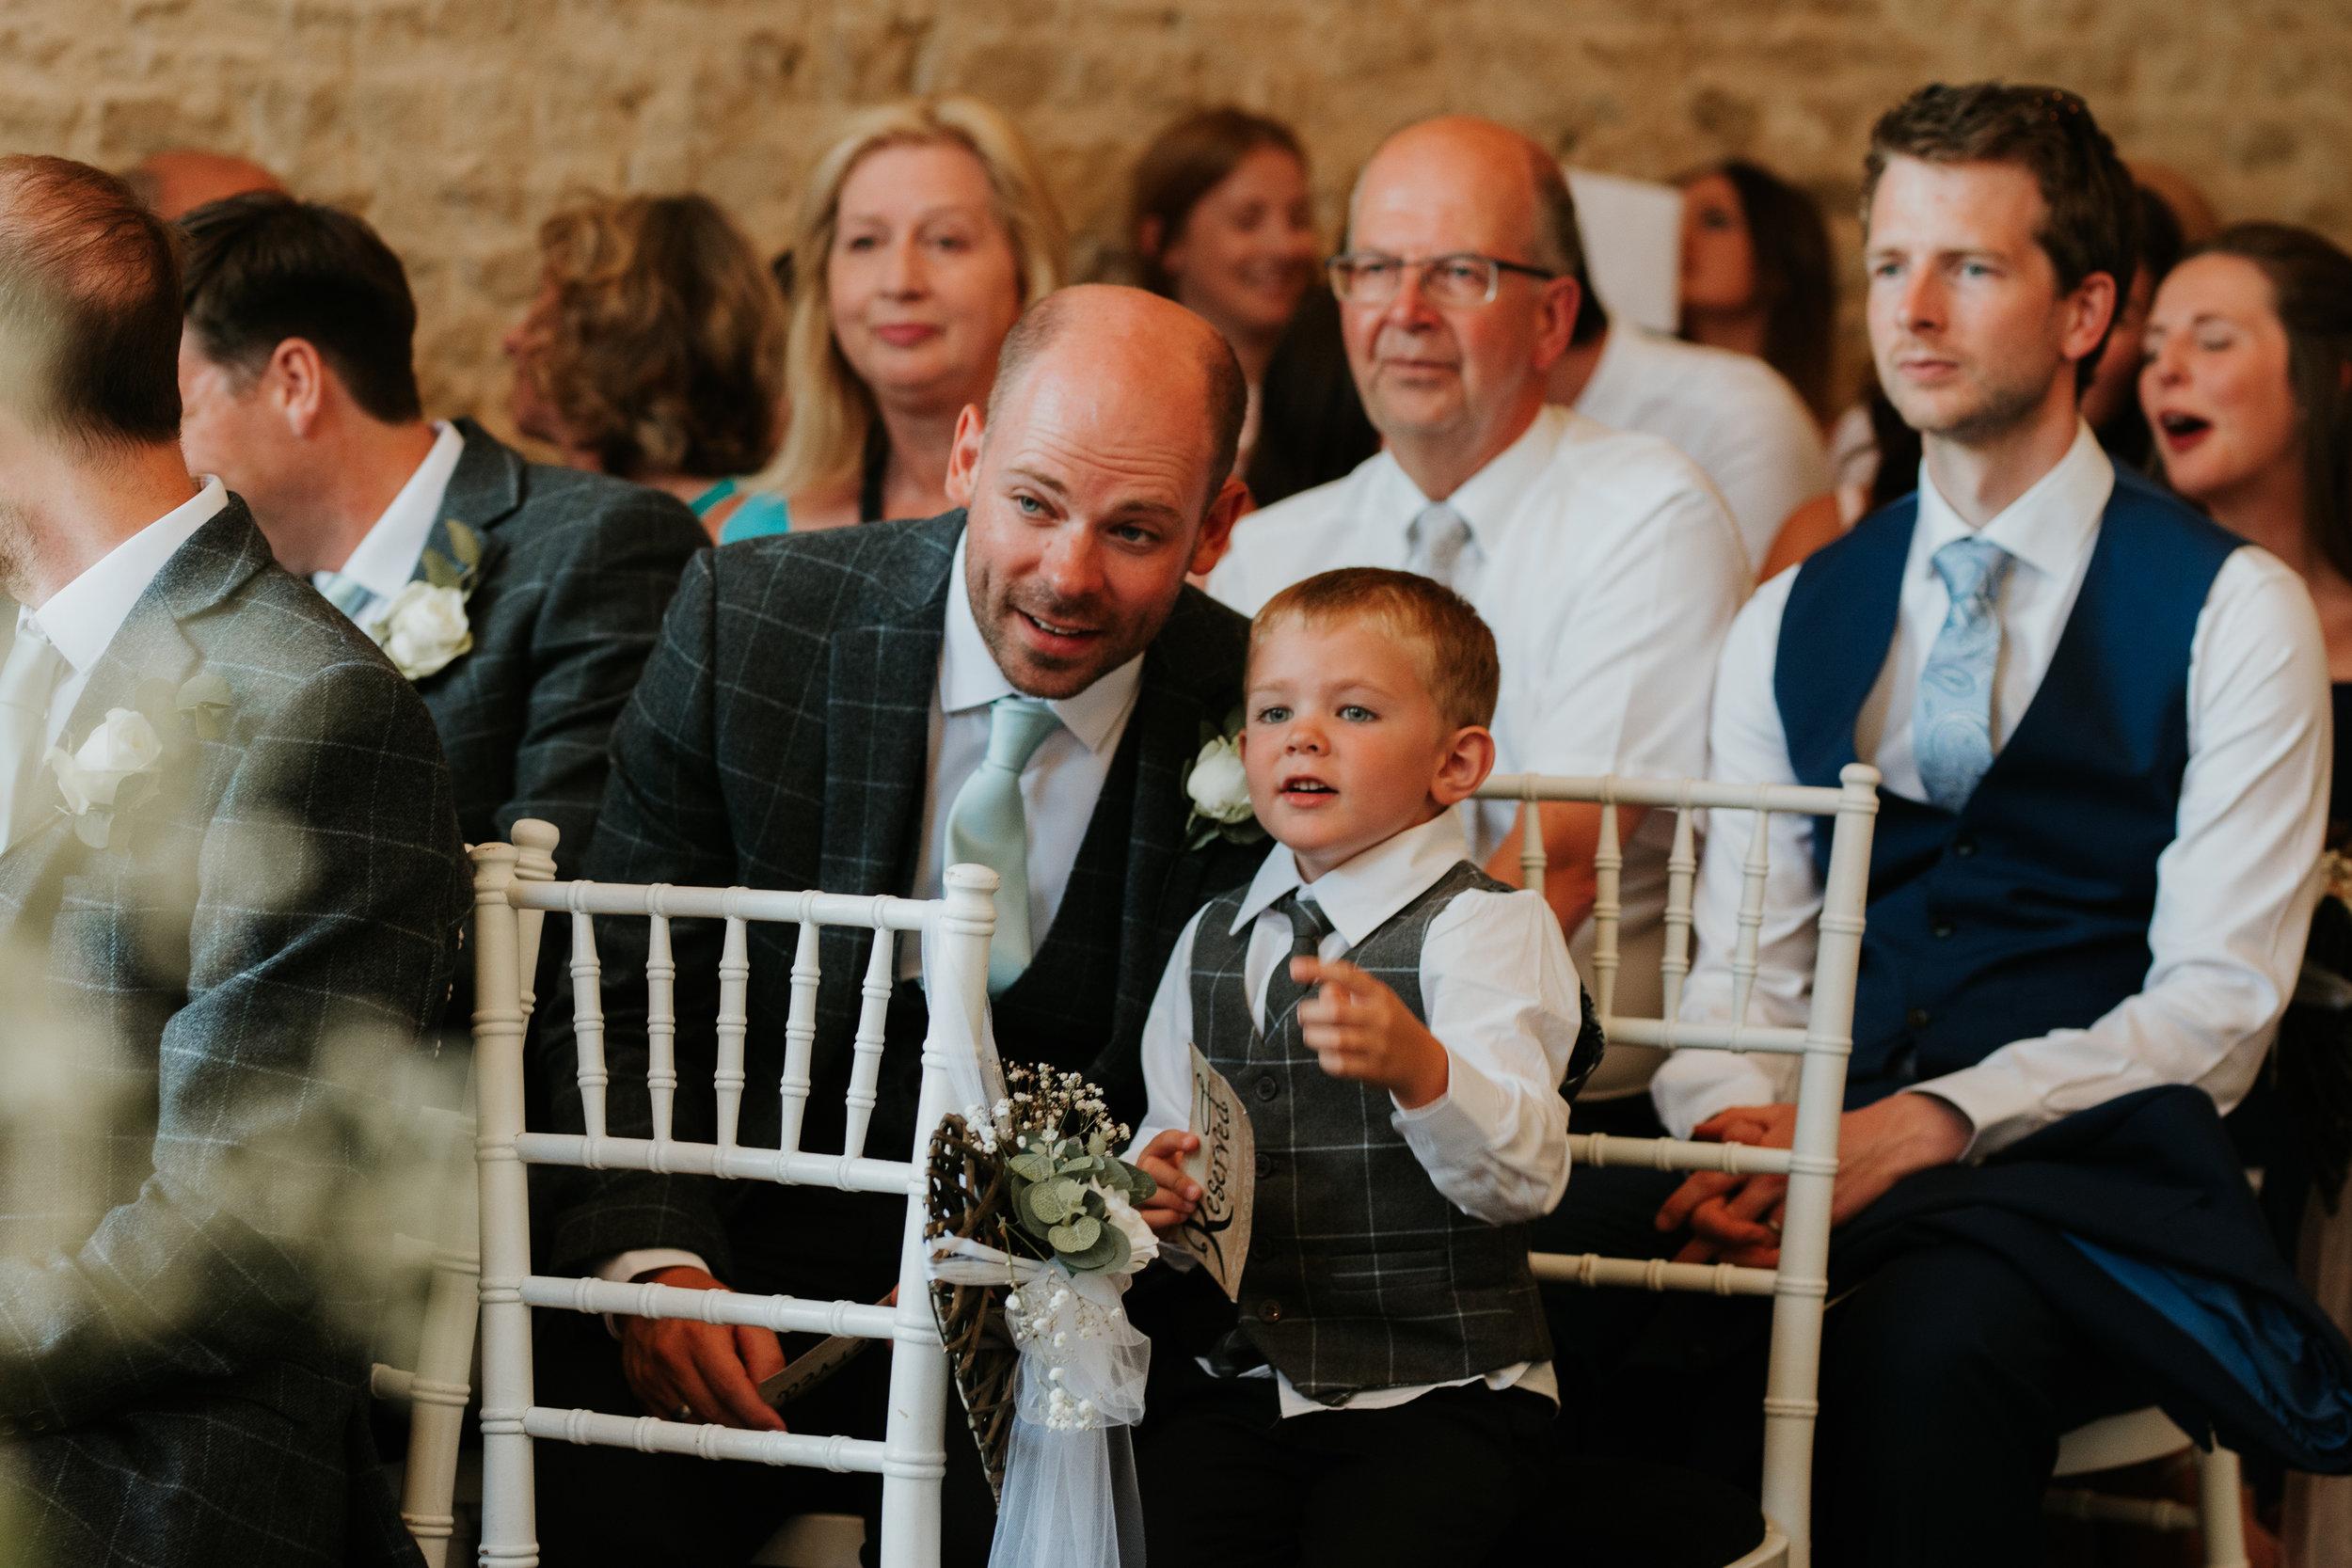 Oxfordshire-wedding-photographer-40.jpg